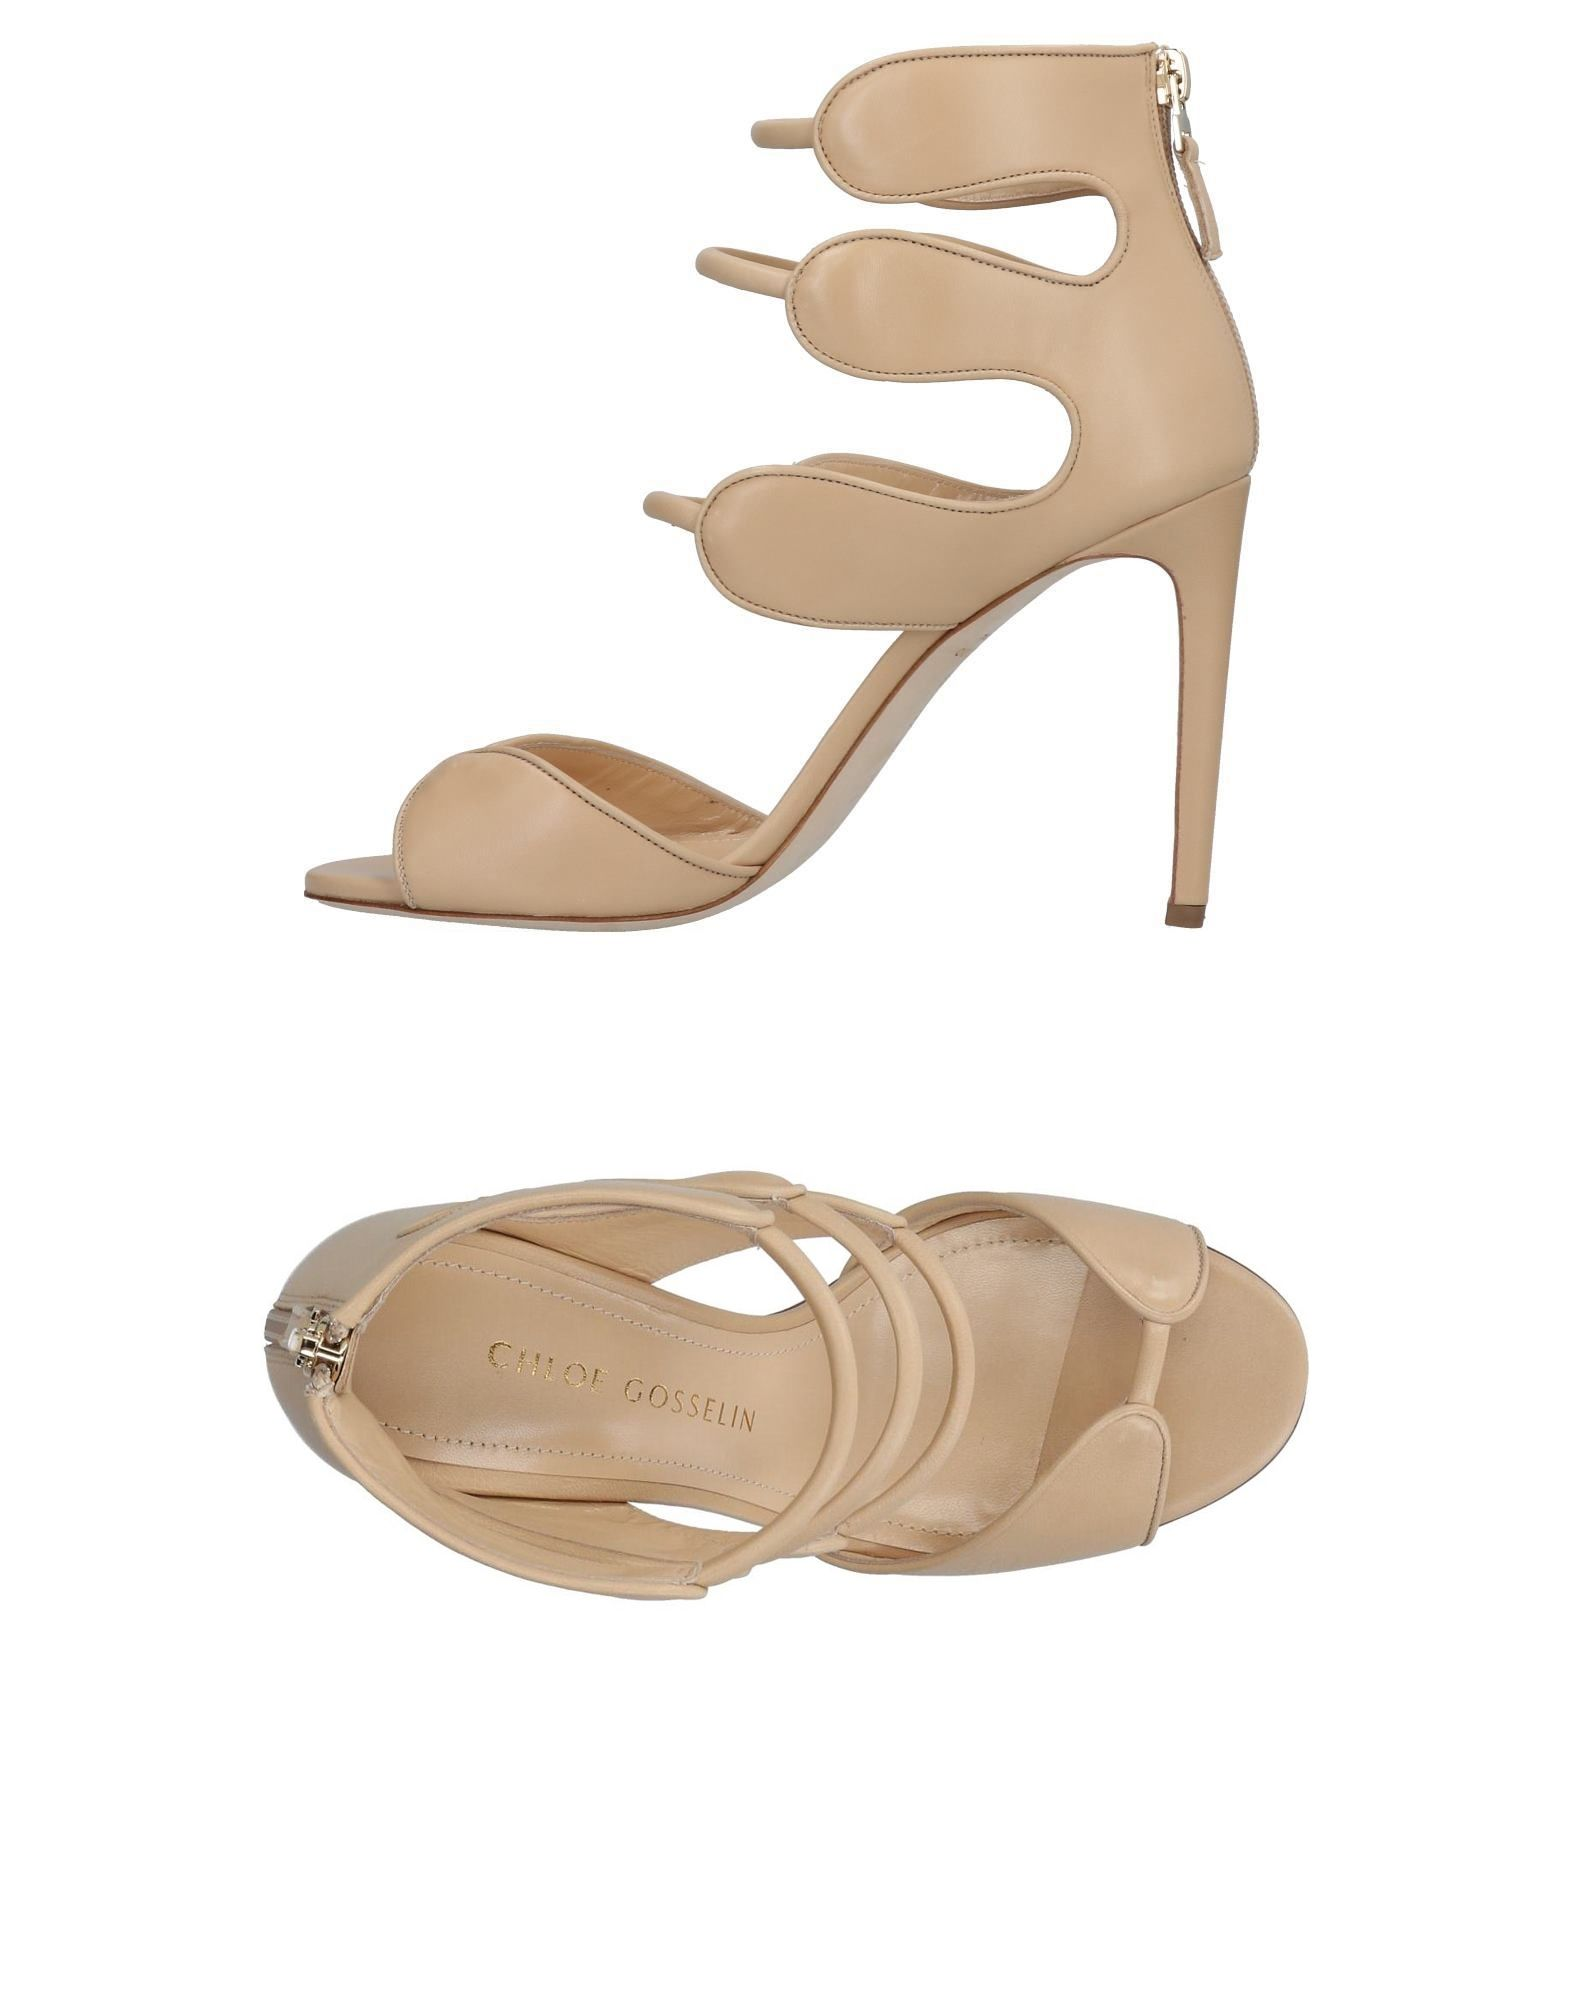 Rabatt Schuhe Chloe Gosselin Sandalen Damen  11483079FB